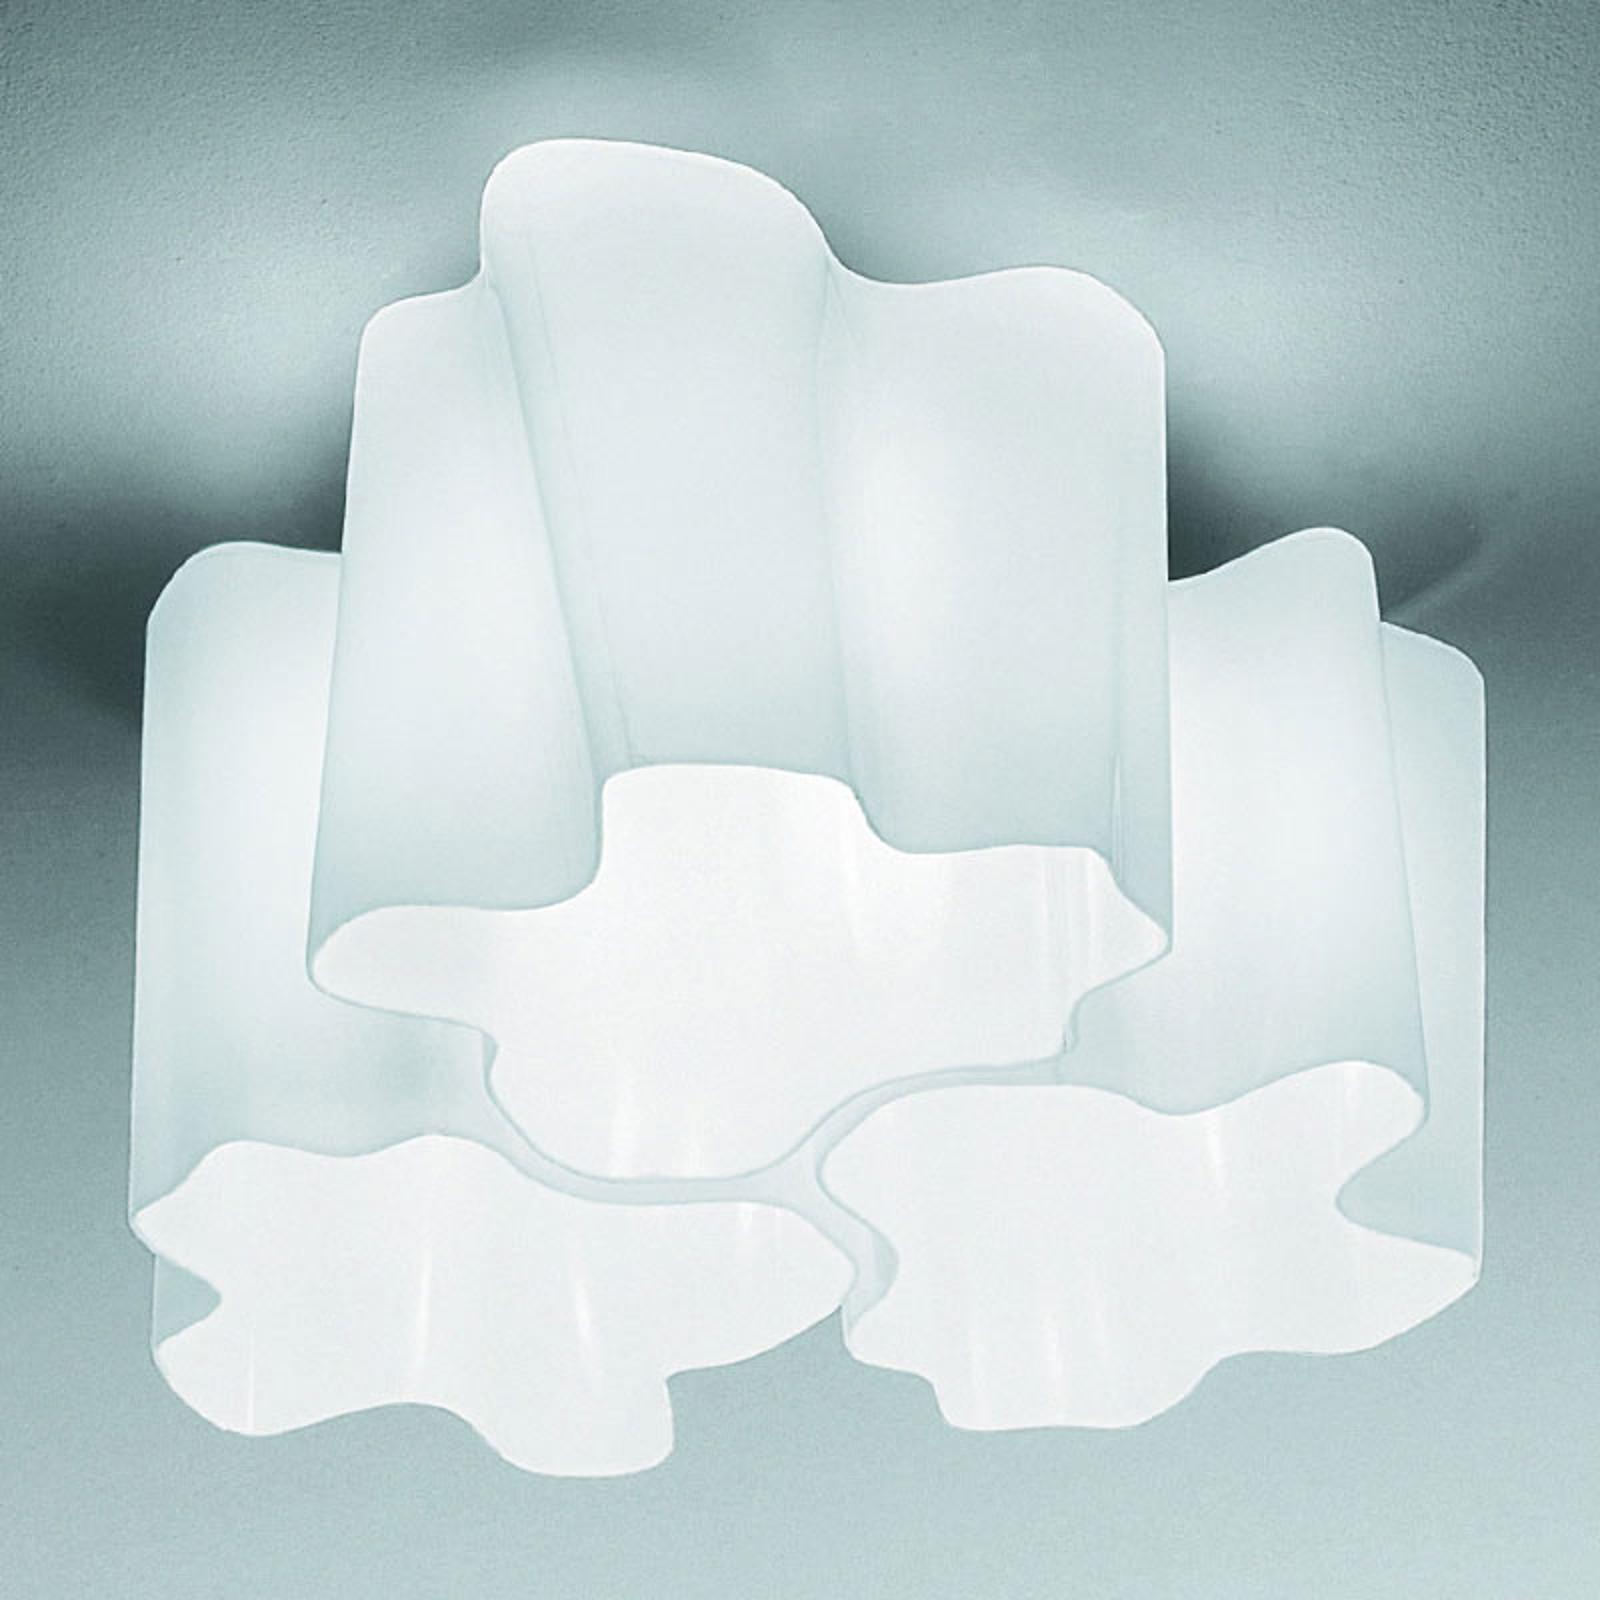 Artemide Logico taklampe 3 lys 120° 45 x 45 cm